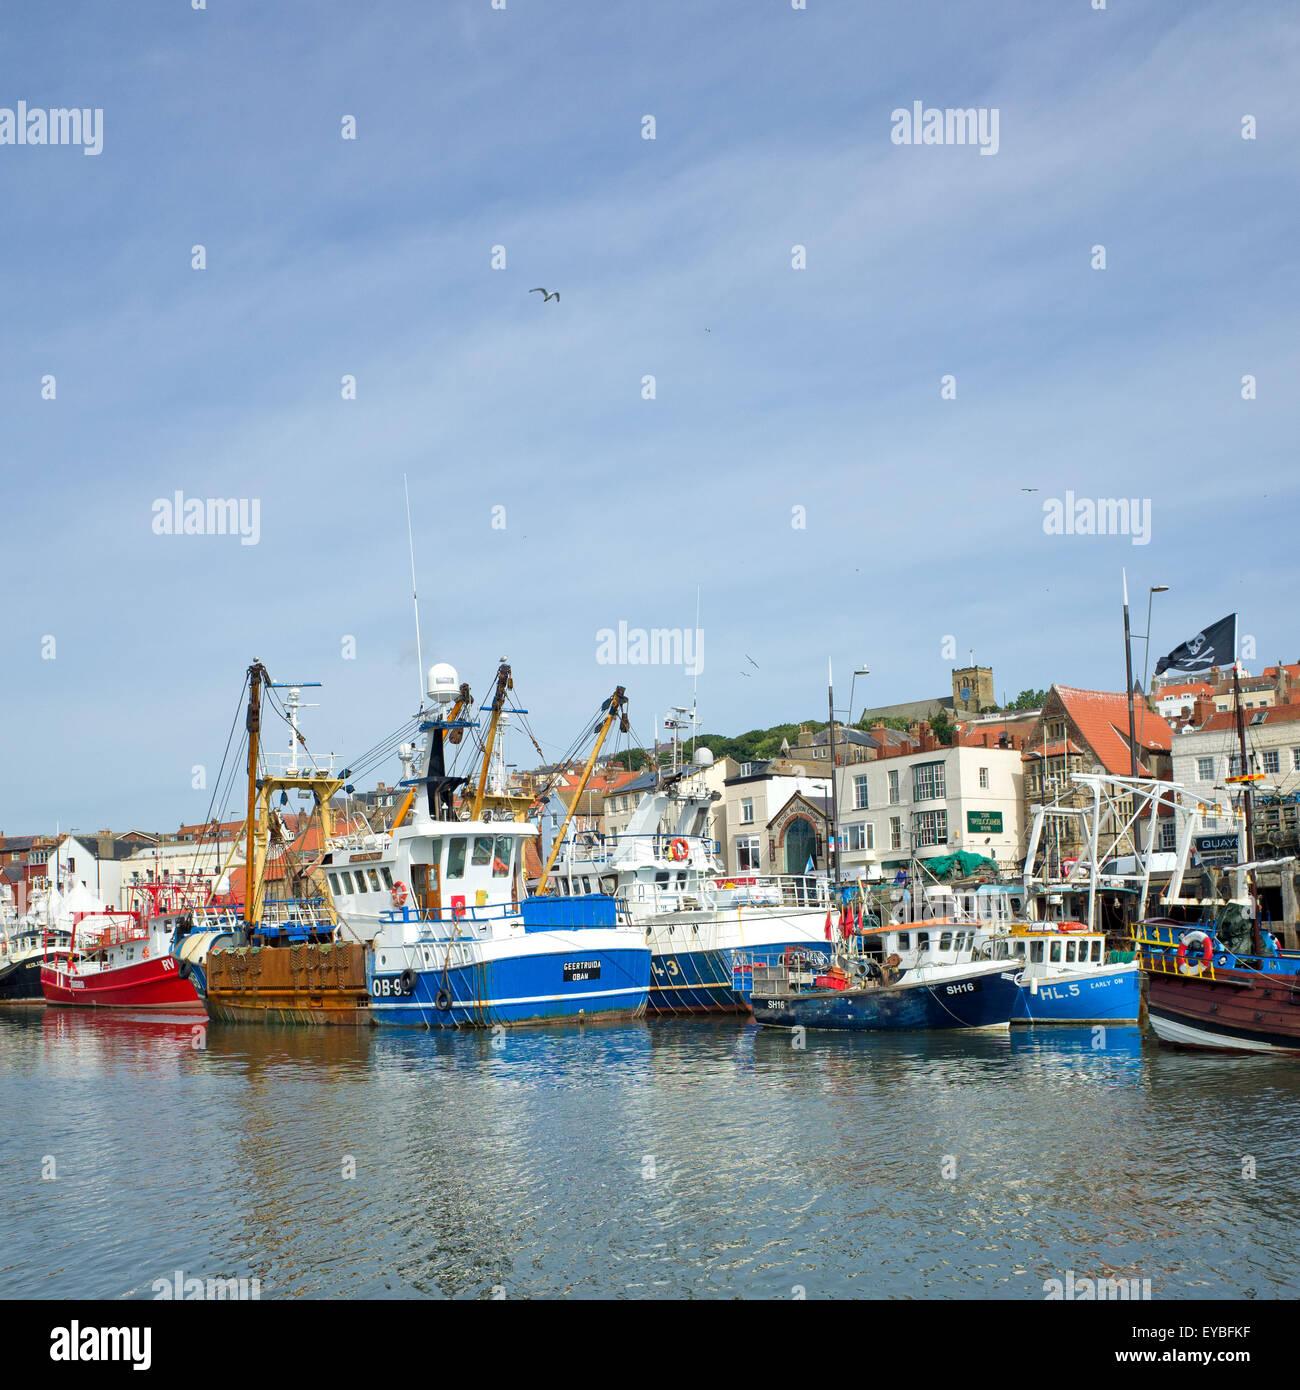 Inshore fishing boats, Scarborough North Yorkshire UK Stock Photo